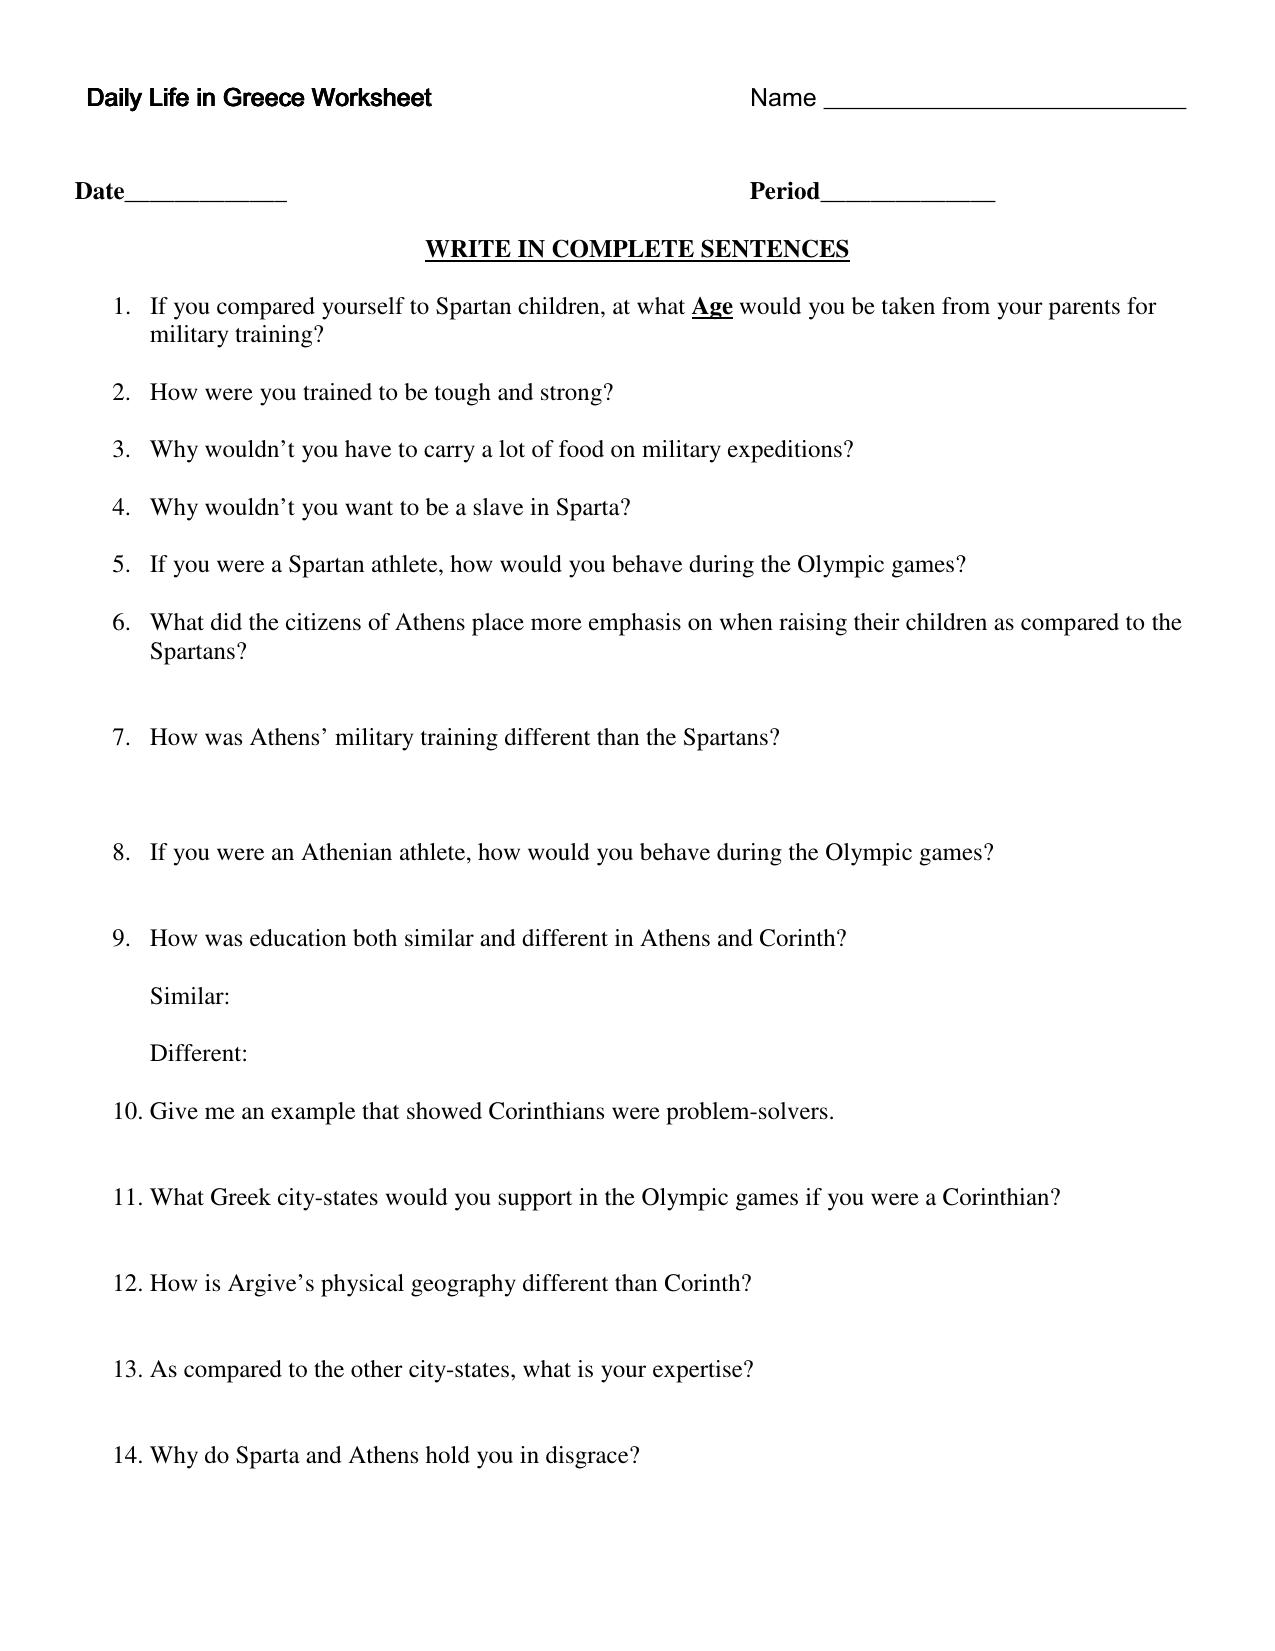 worksheet Ancient Greece Worksheets worksheets ancient greece pureluckrestaurant free daily life in worksheet worksheet